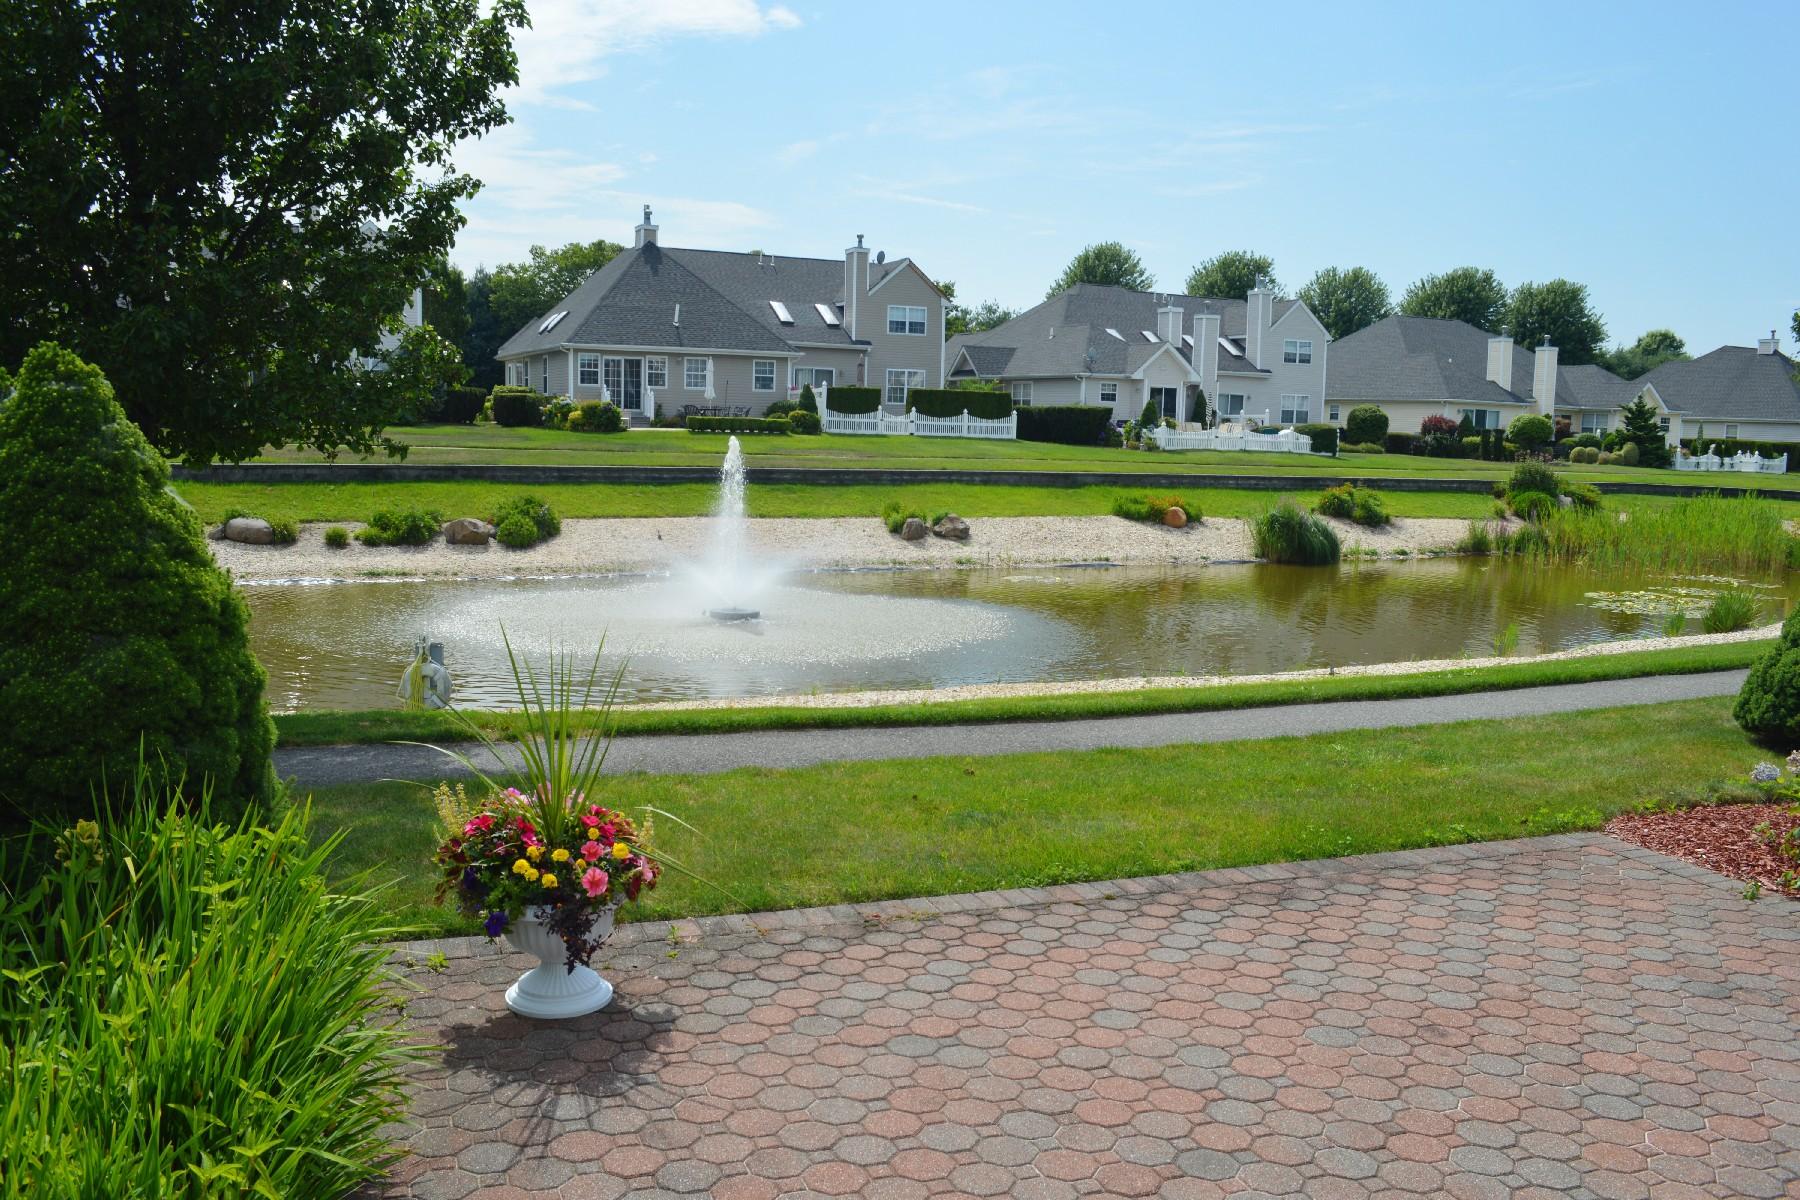 Condominium for Sale at Condo 54 Goose Neck Ln 1 Riverhead, New York 11901 United States